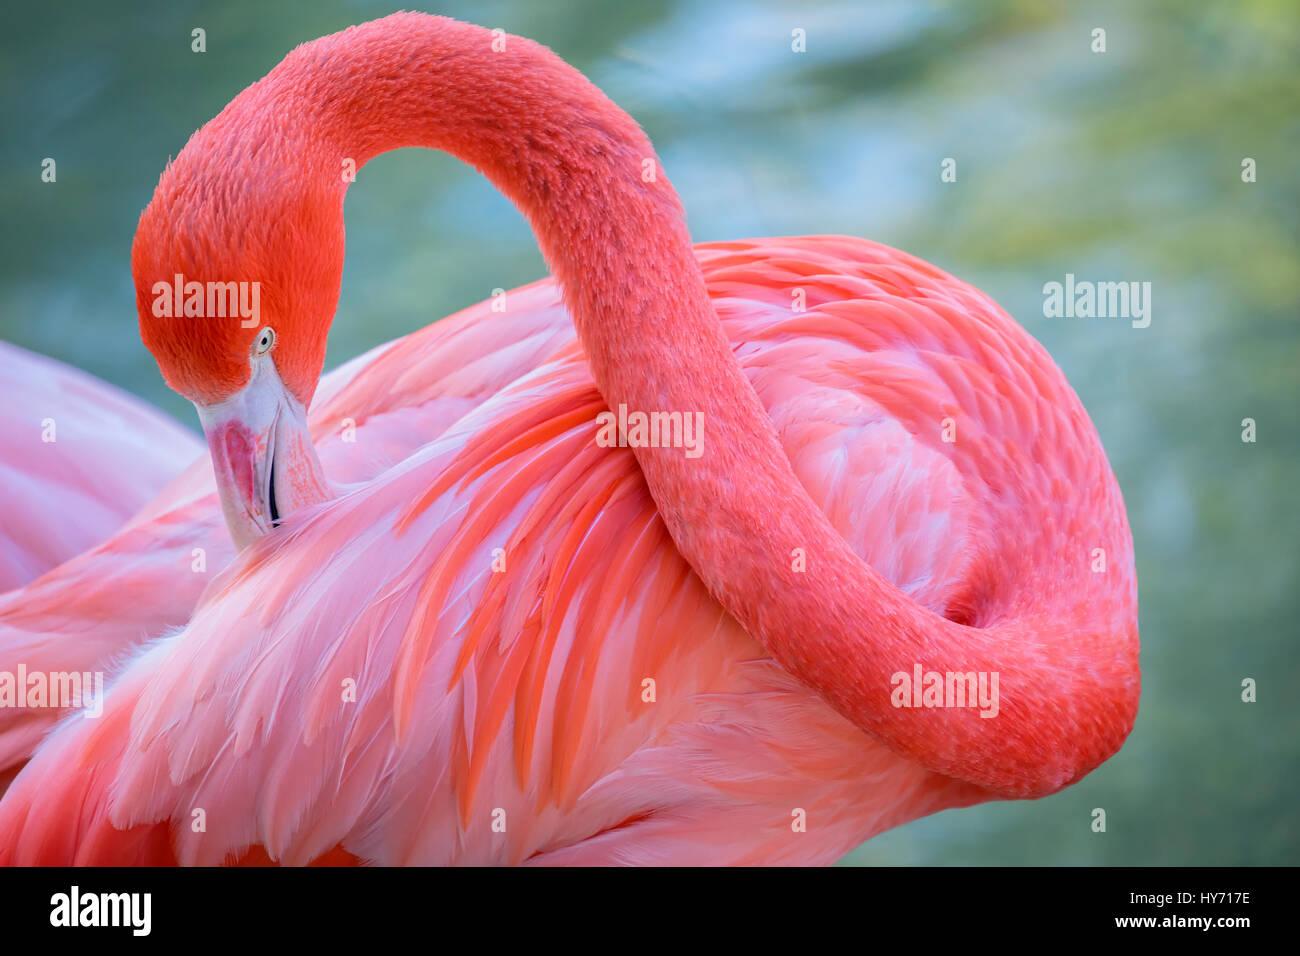 The colorful Caribbean Flamingo - Stock Image